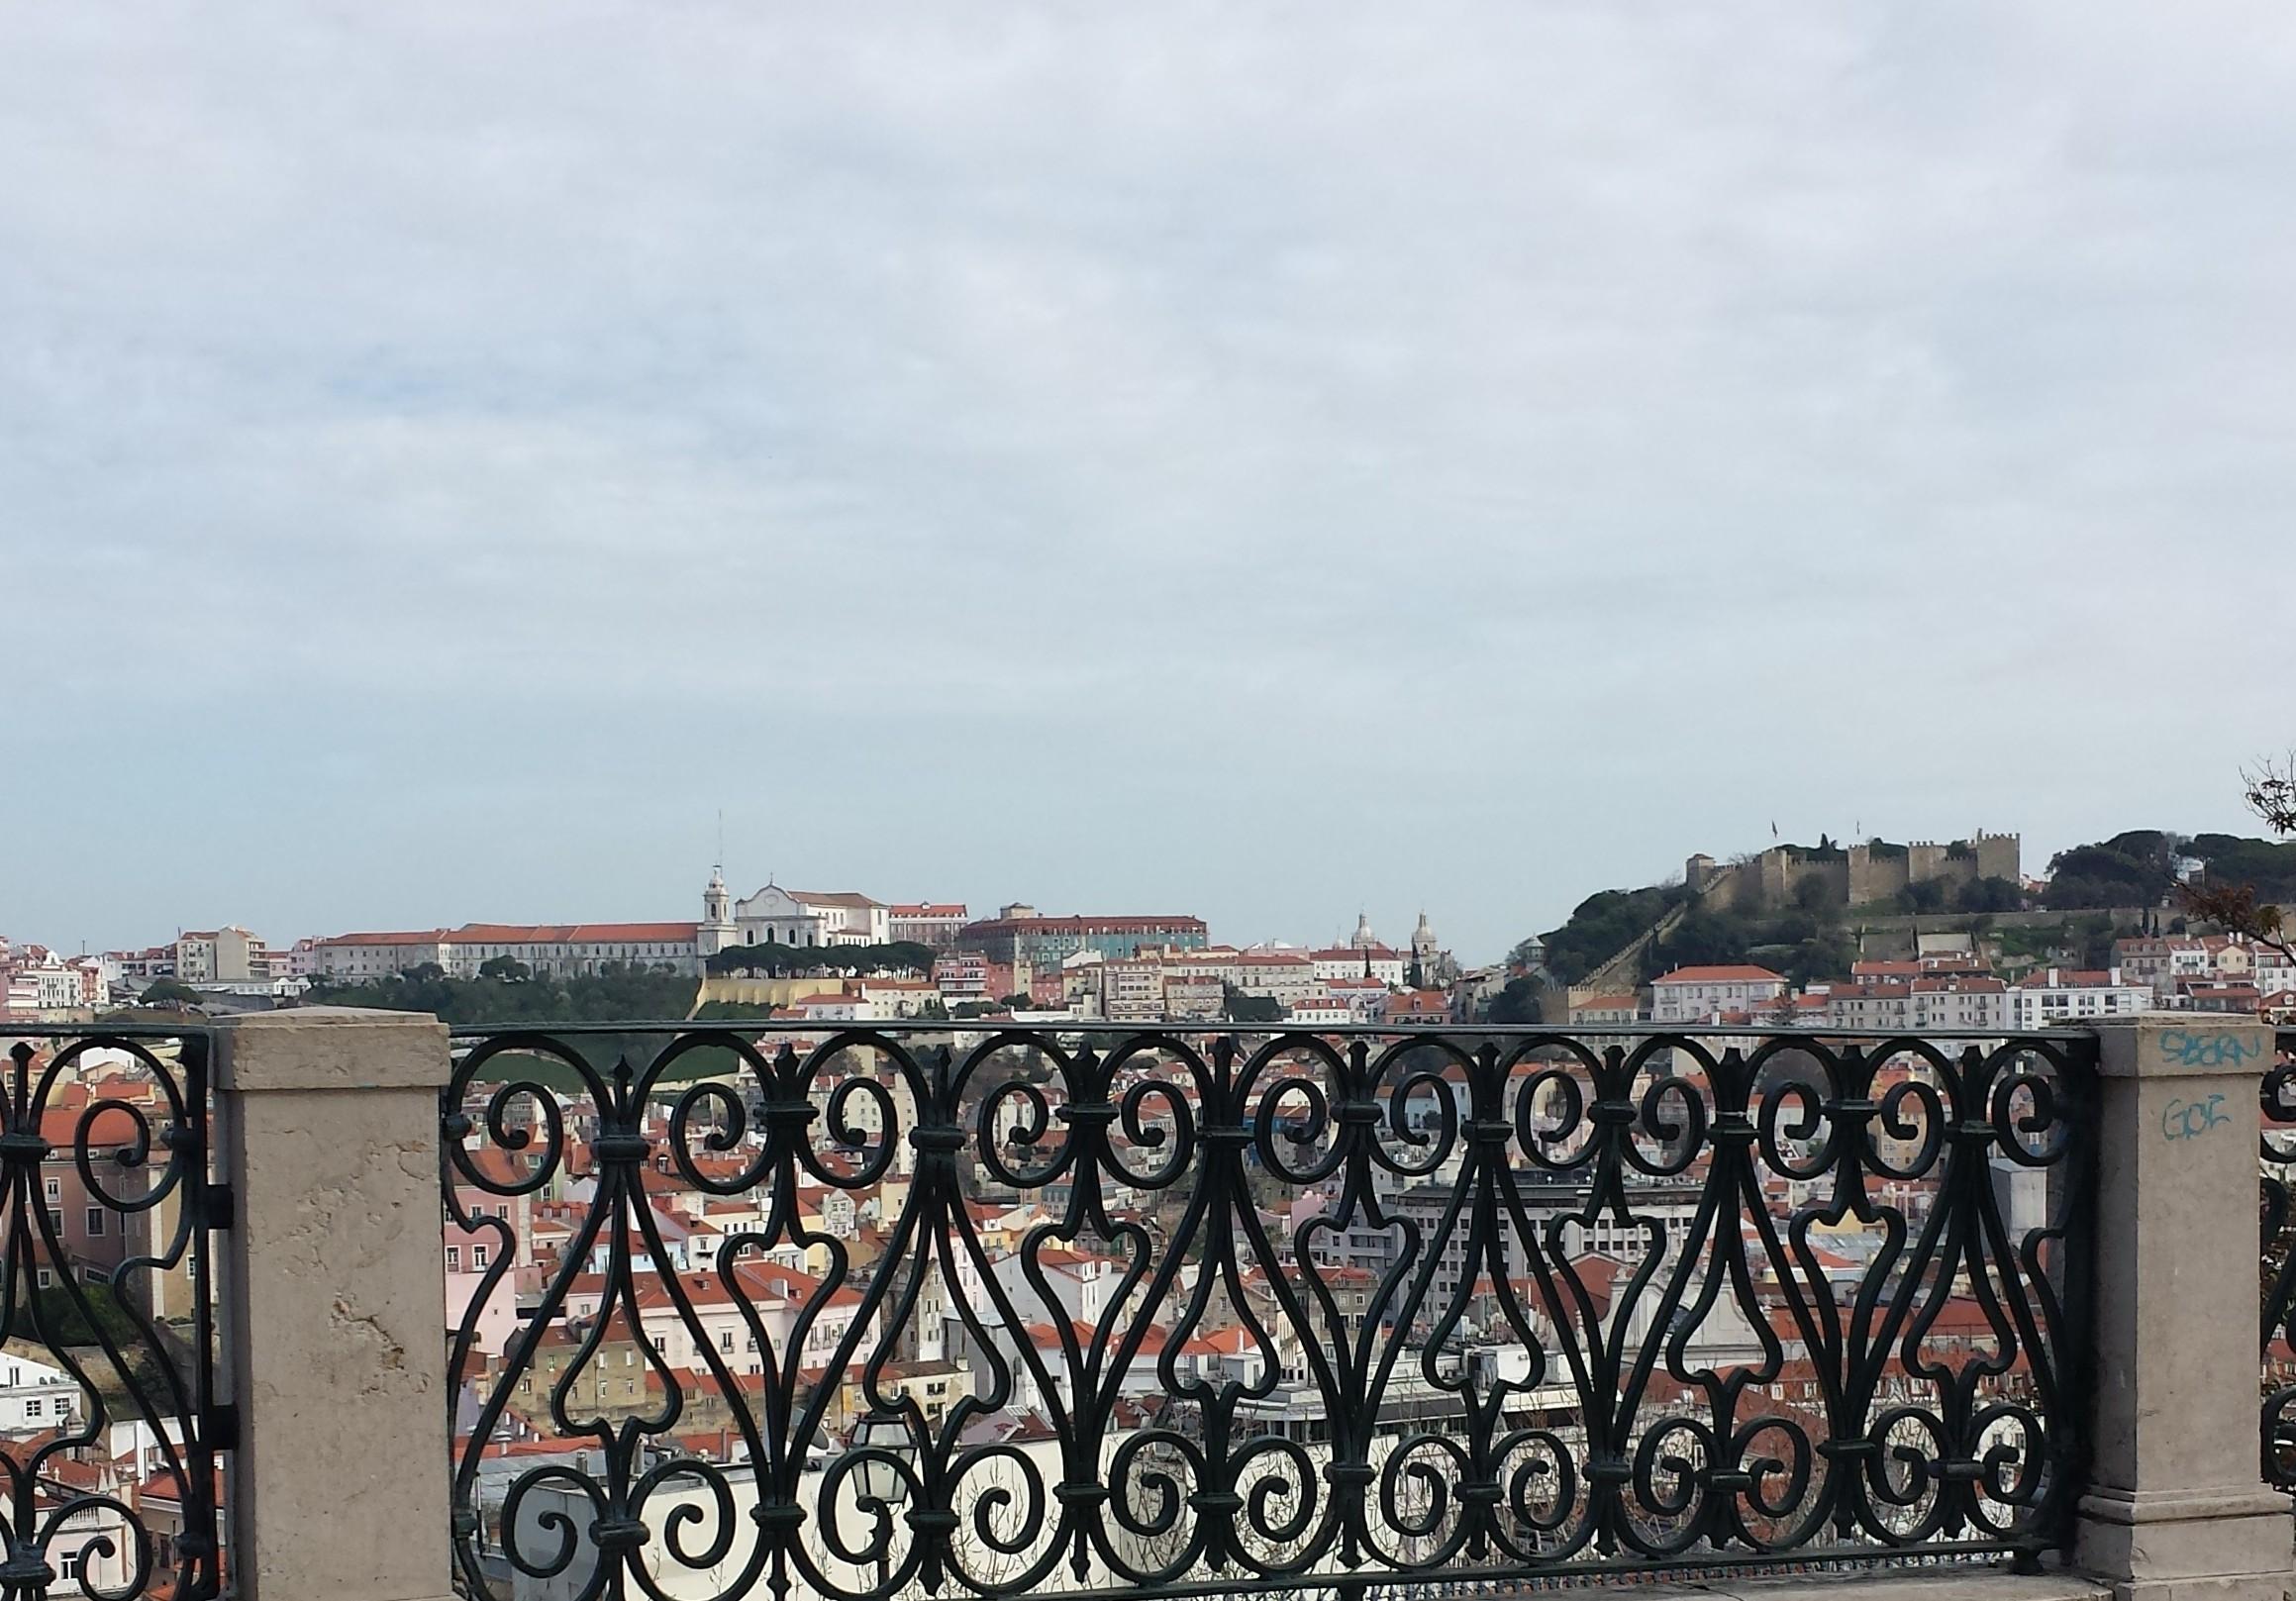 Aussicht Lissabon S. Pedro de Alcântara im Februar